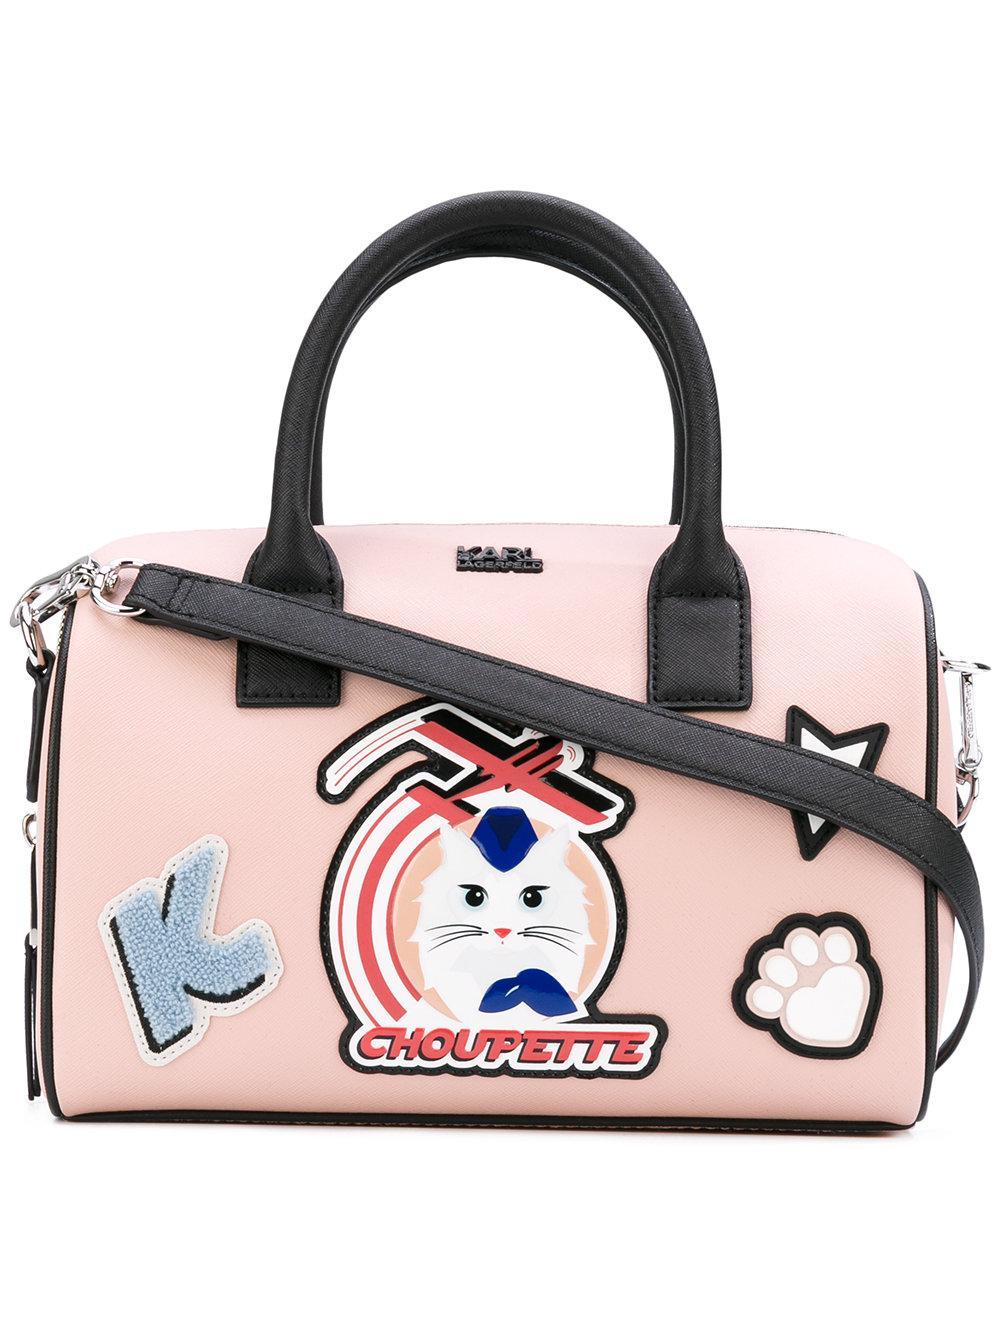 9b894300523d Lyst - Karl Lagerfeld Cat Motif Tote in Pink